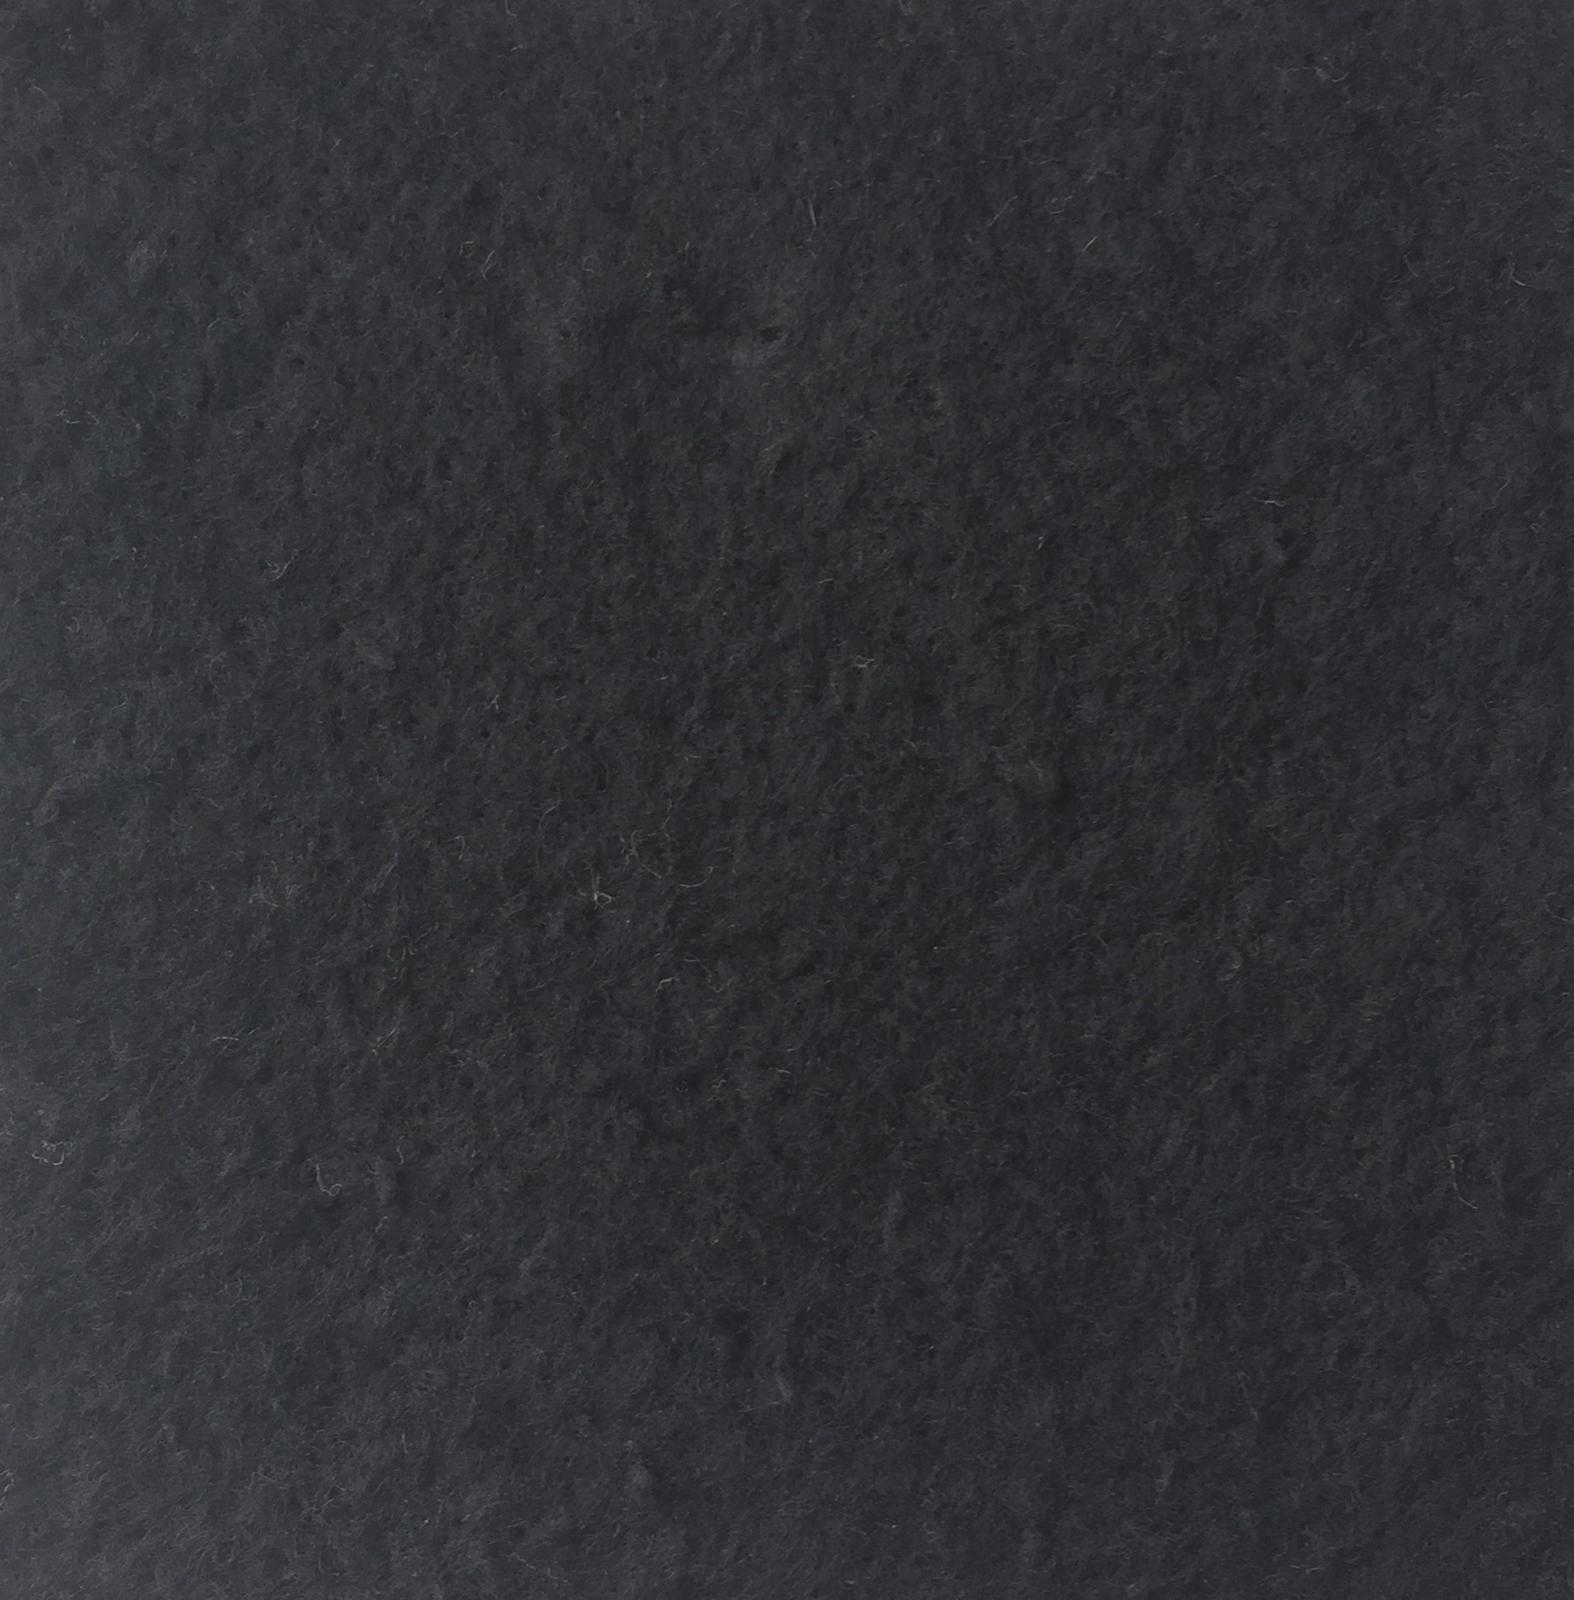 Hobbs 80/20 Black Cotton Blend - 108 x 30yds